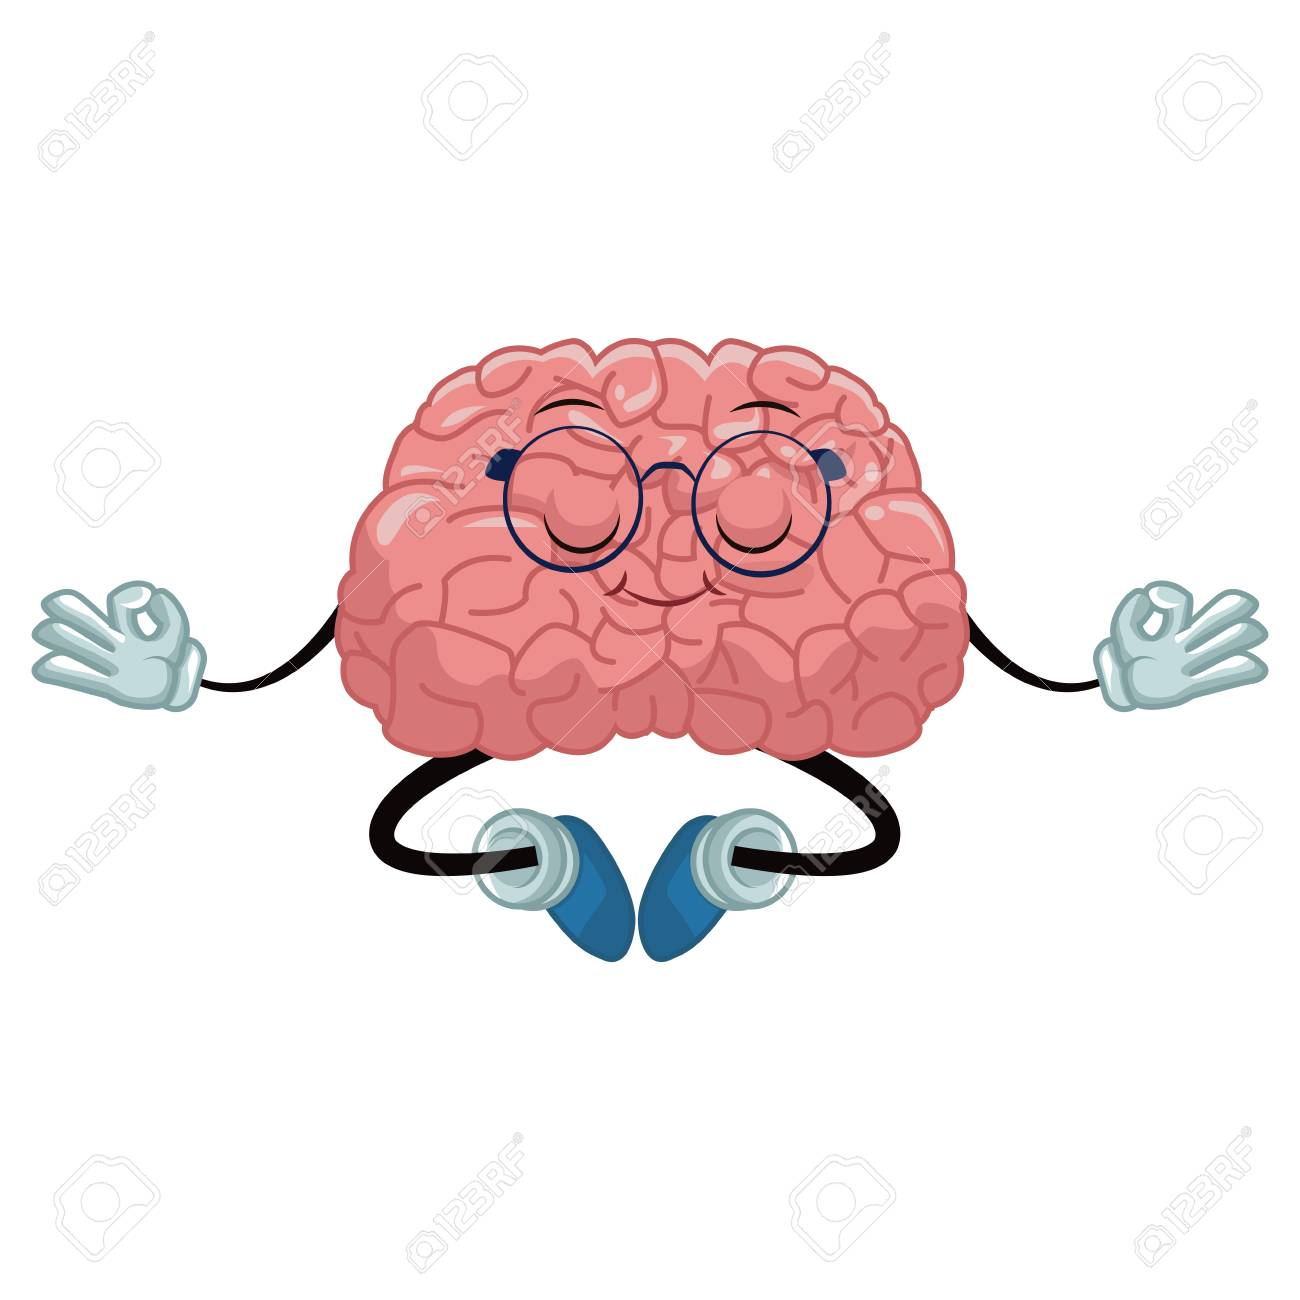 cute brain meditating cartoon icon vector illustration graphic royalty free cliparts vectors and stock illustration image 87905541 cute brain meditating cartoon icon vector illustration graphic